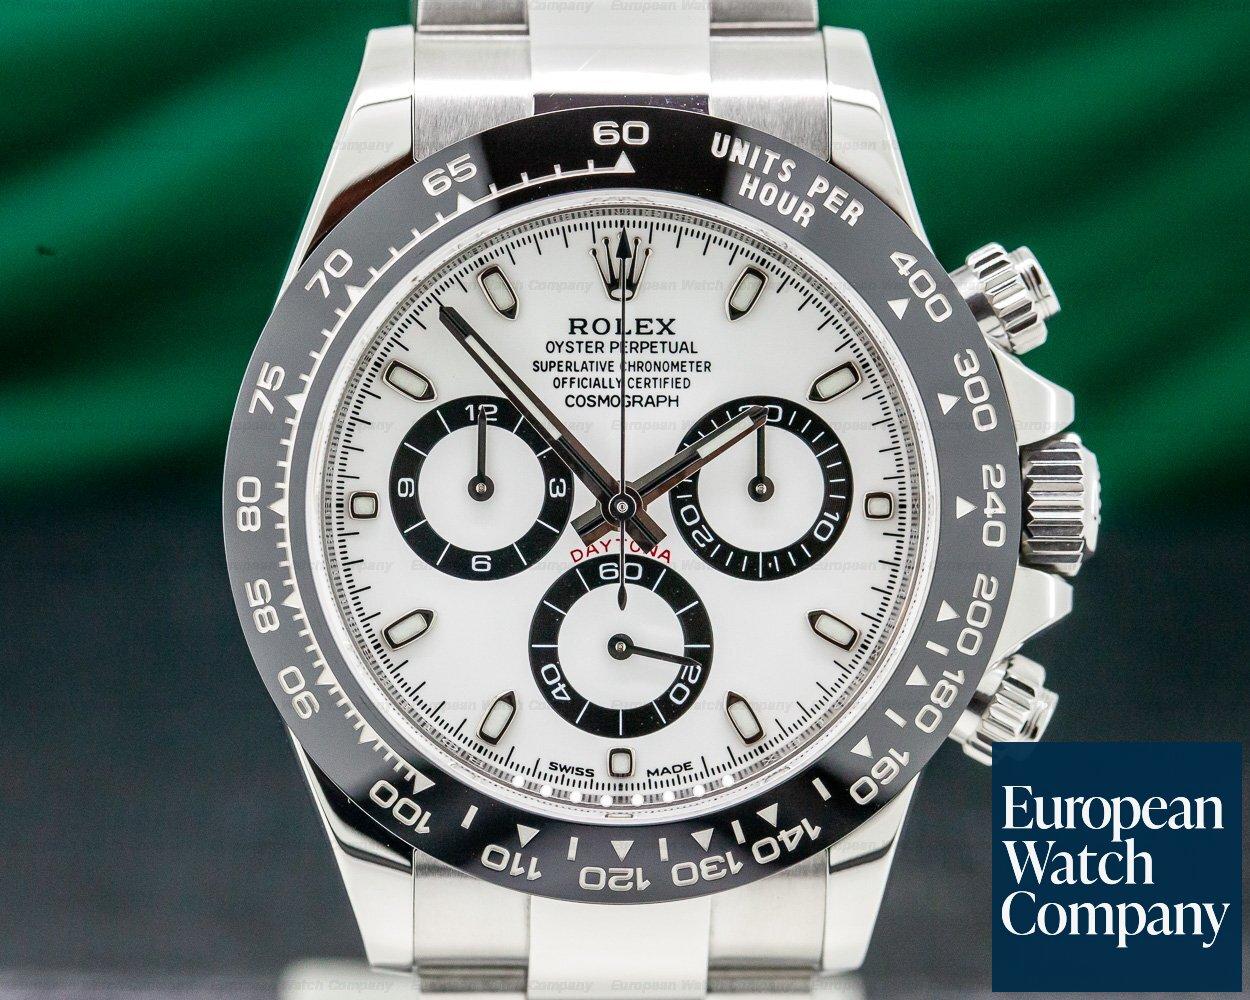 Rolex 116500LN Daytona Ceramic Bezel SS / White Dial